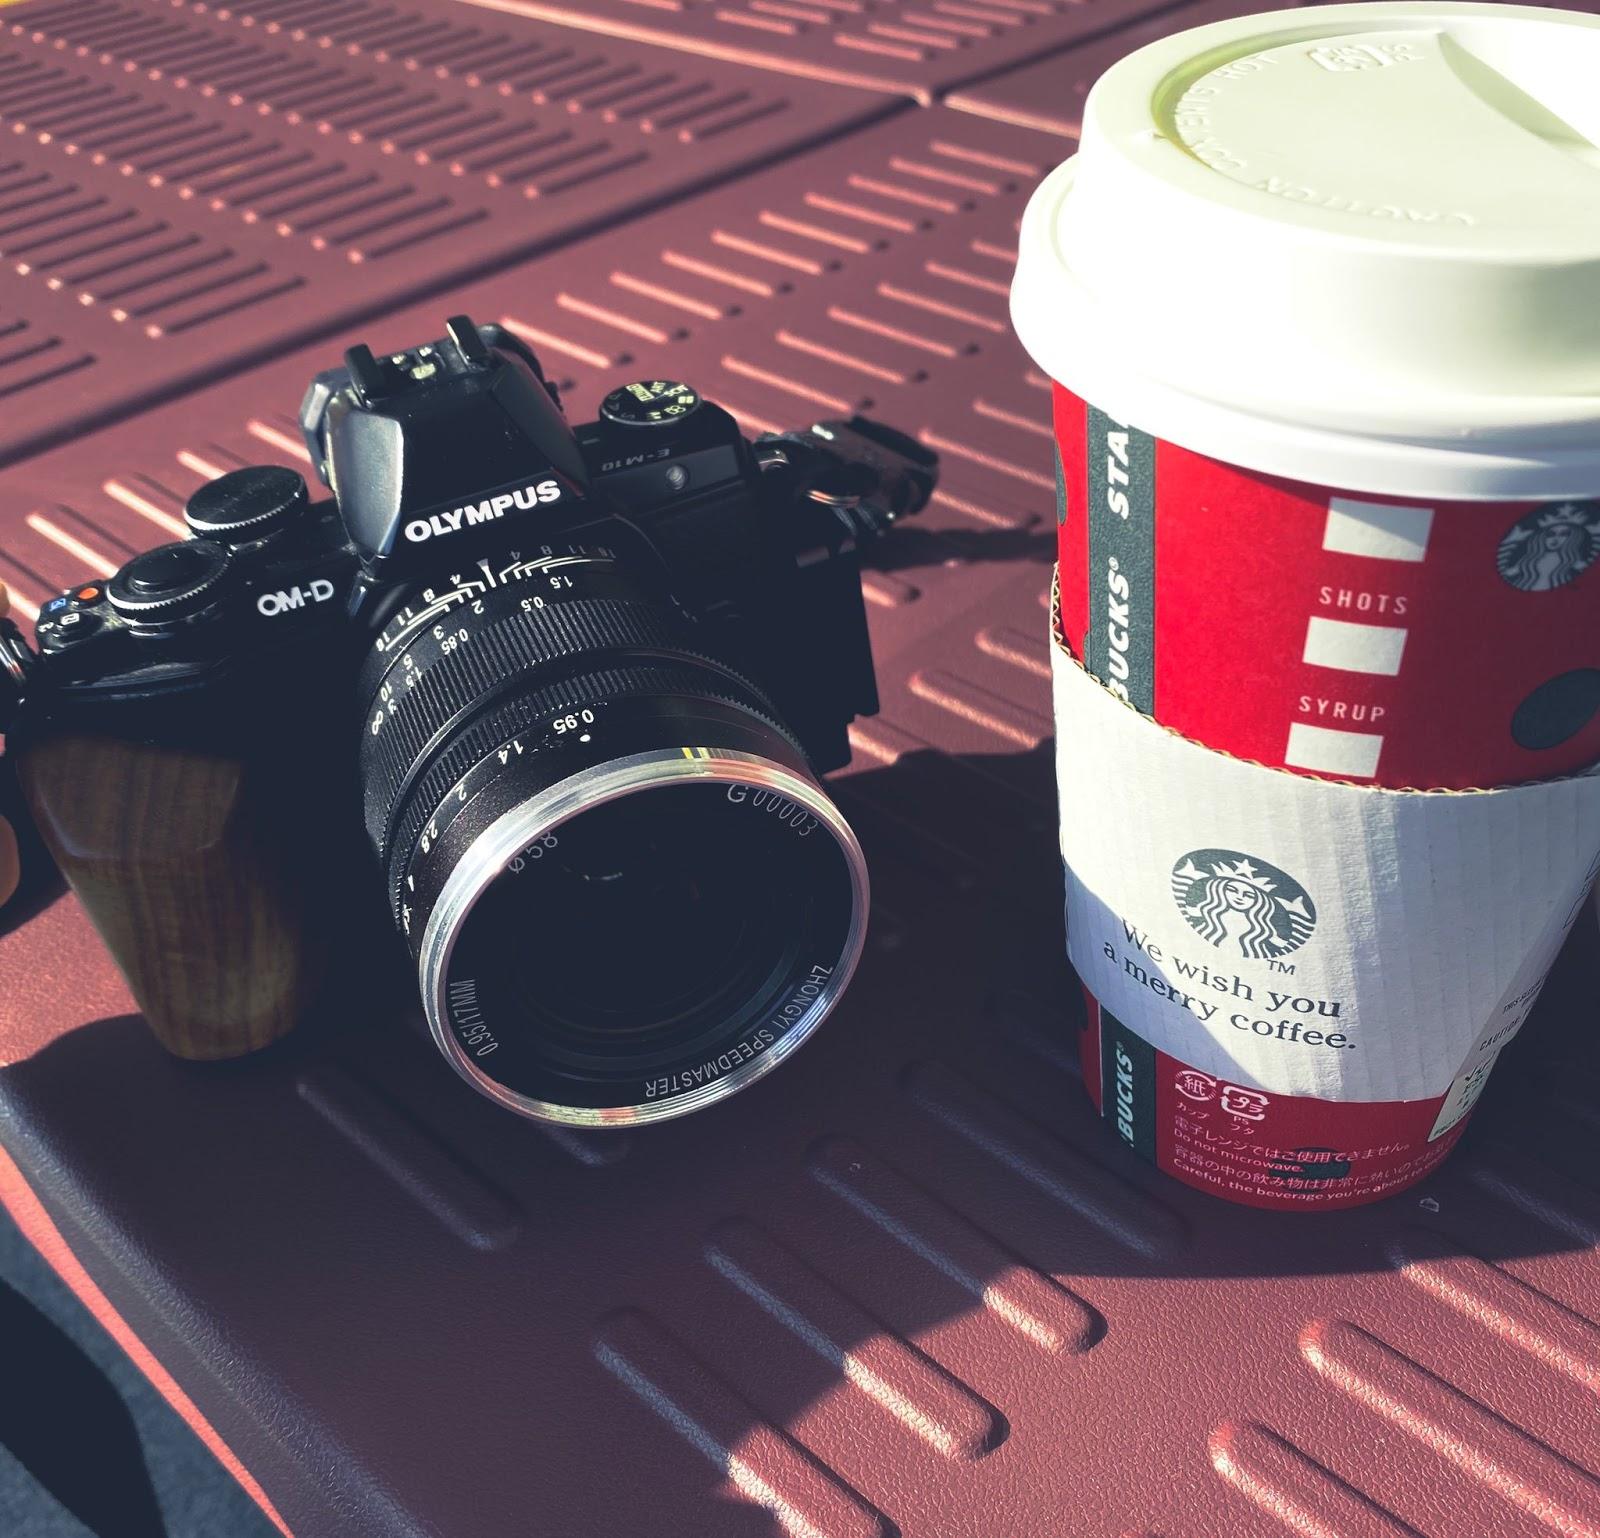 Объектив ZhongYi Speedmaster 17mm f/0.95 с камерой Olympus